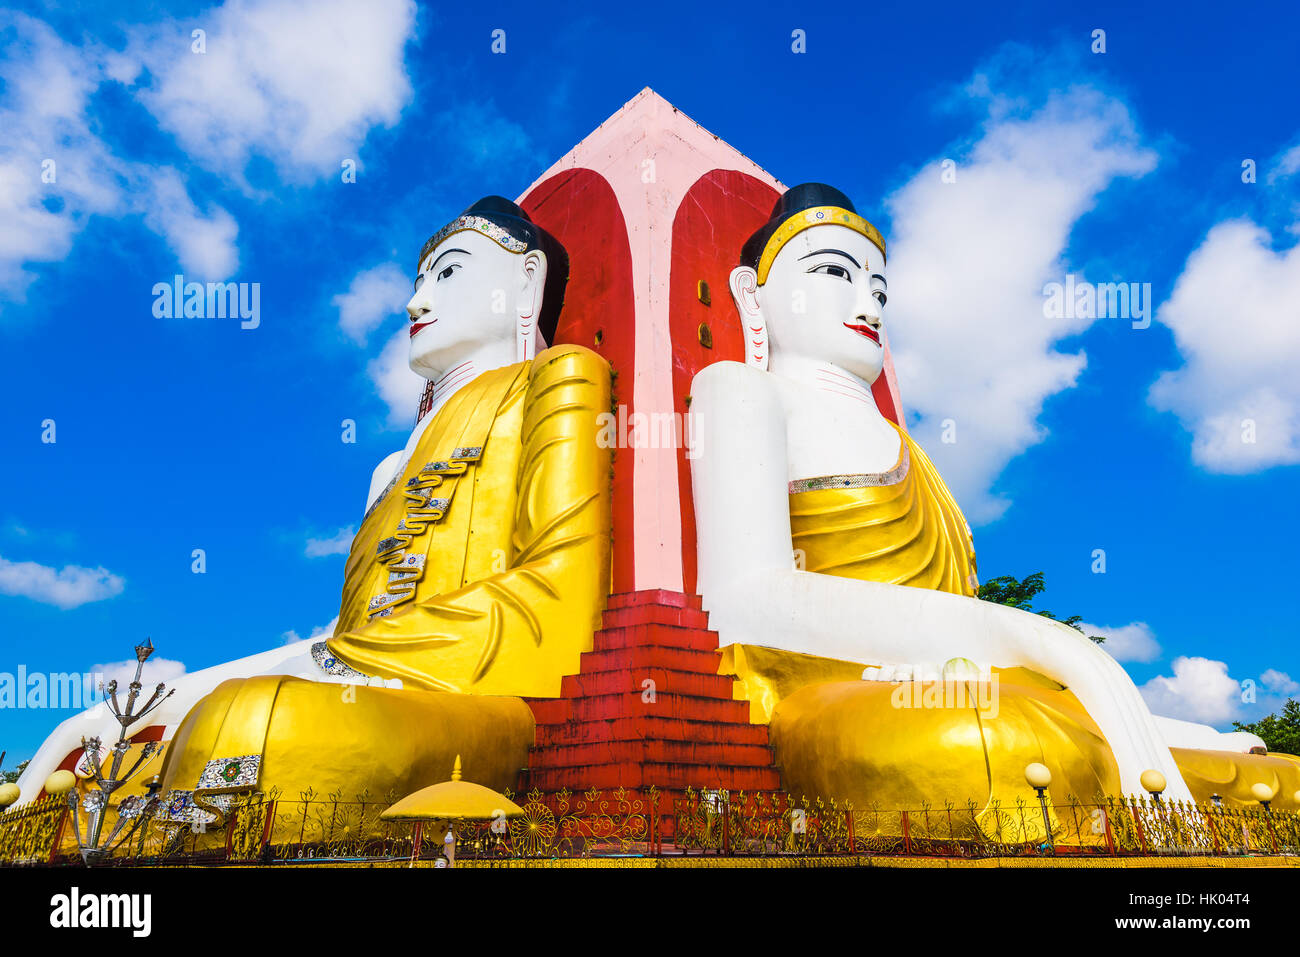 Bago, Myanmar vier Gesichter des Buddha am Kyaikpun Buddha. Stockbild